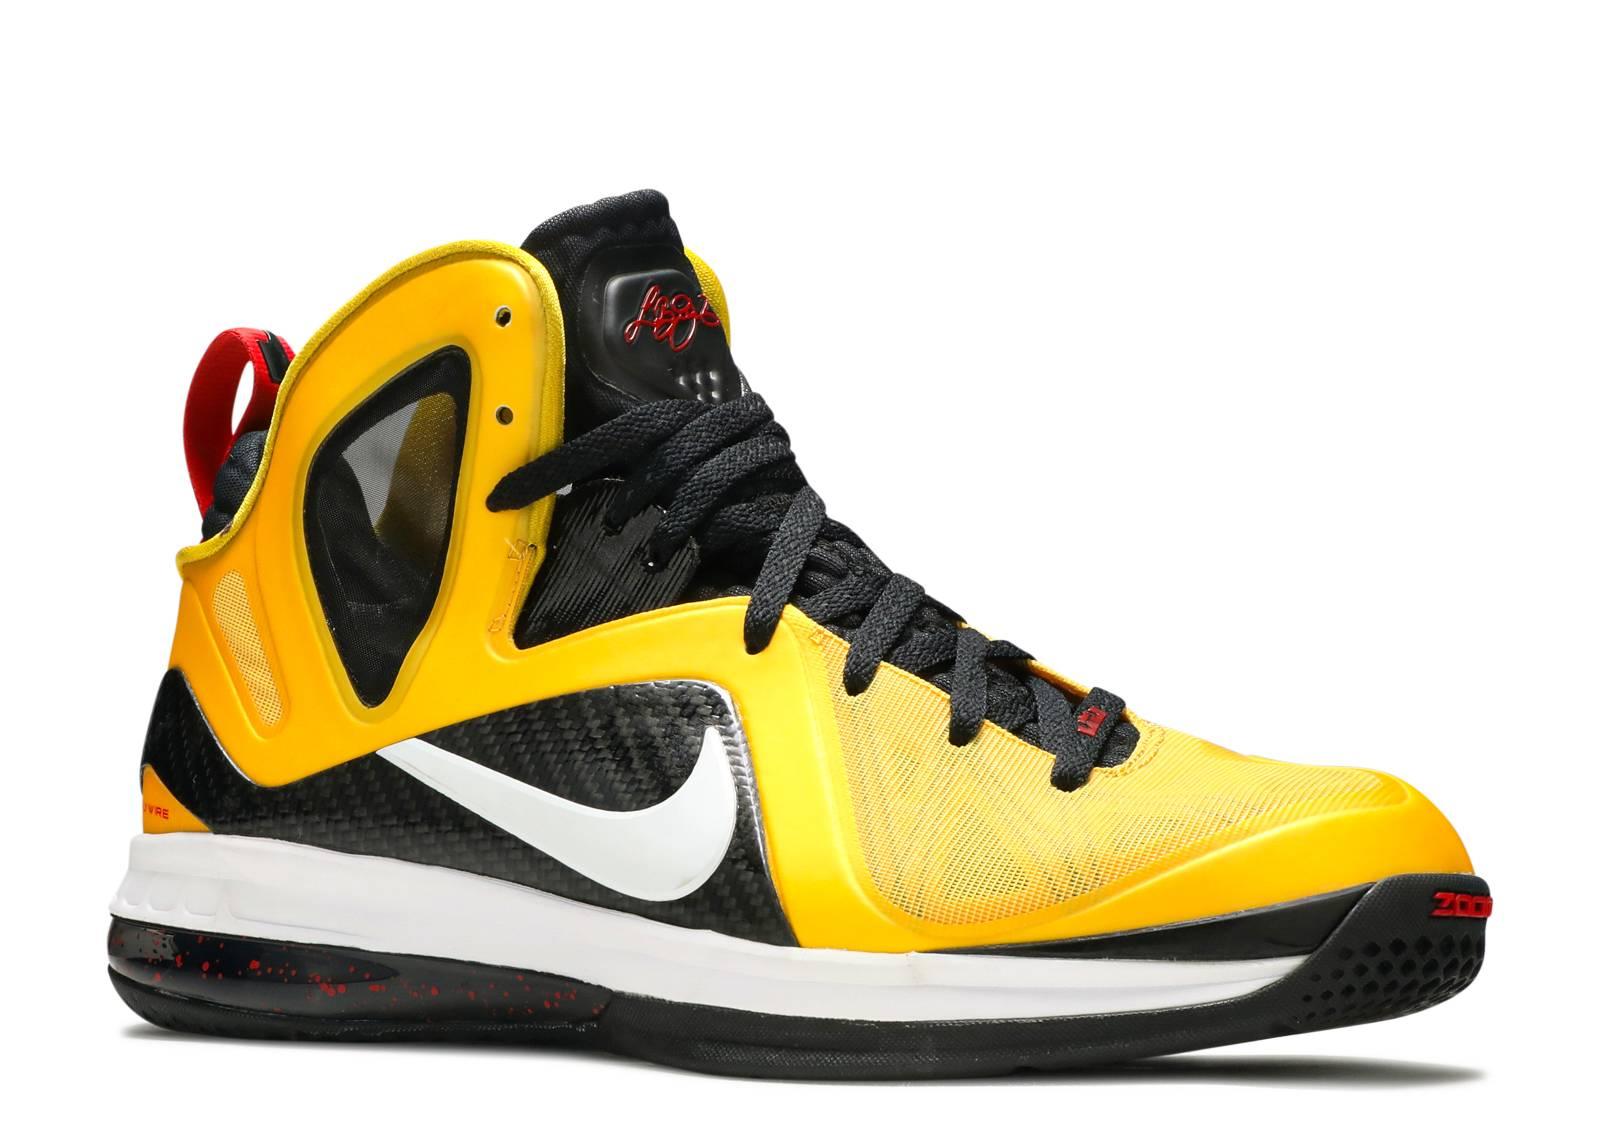 promo code 0bd1b e4ddb lebron 9 black yellow